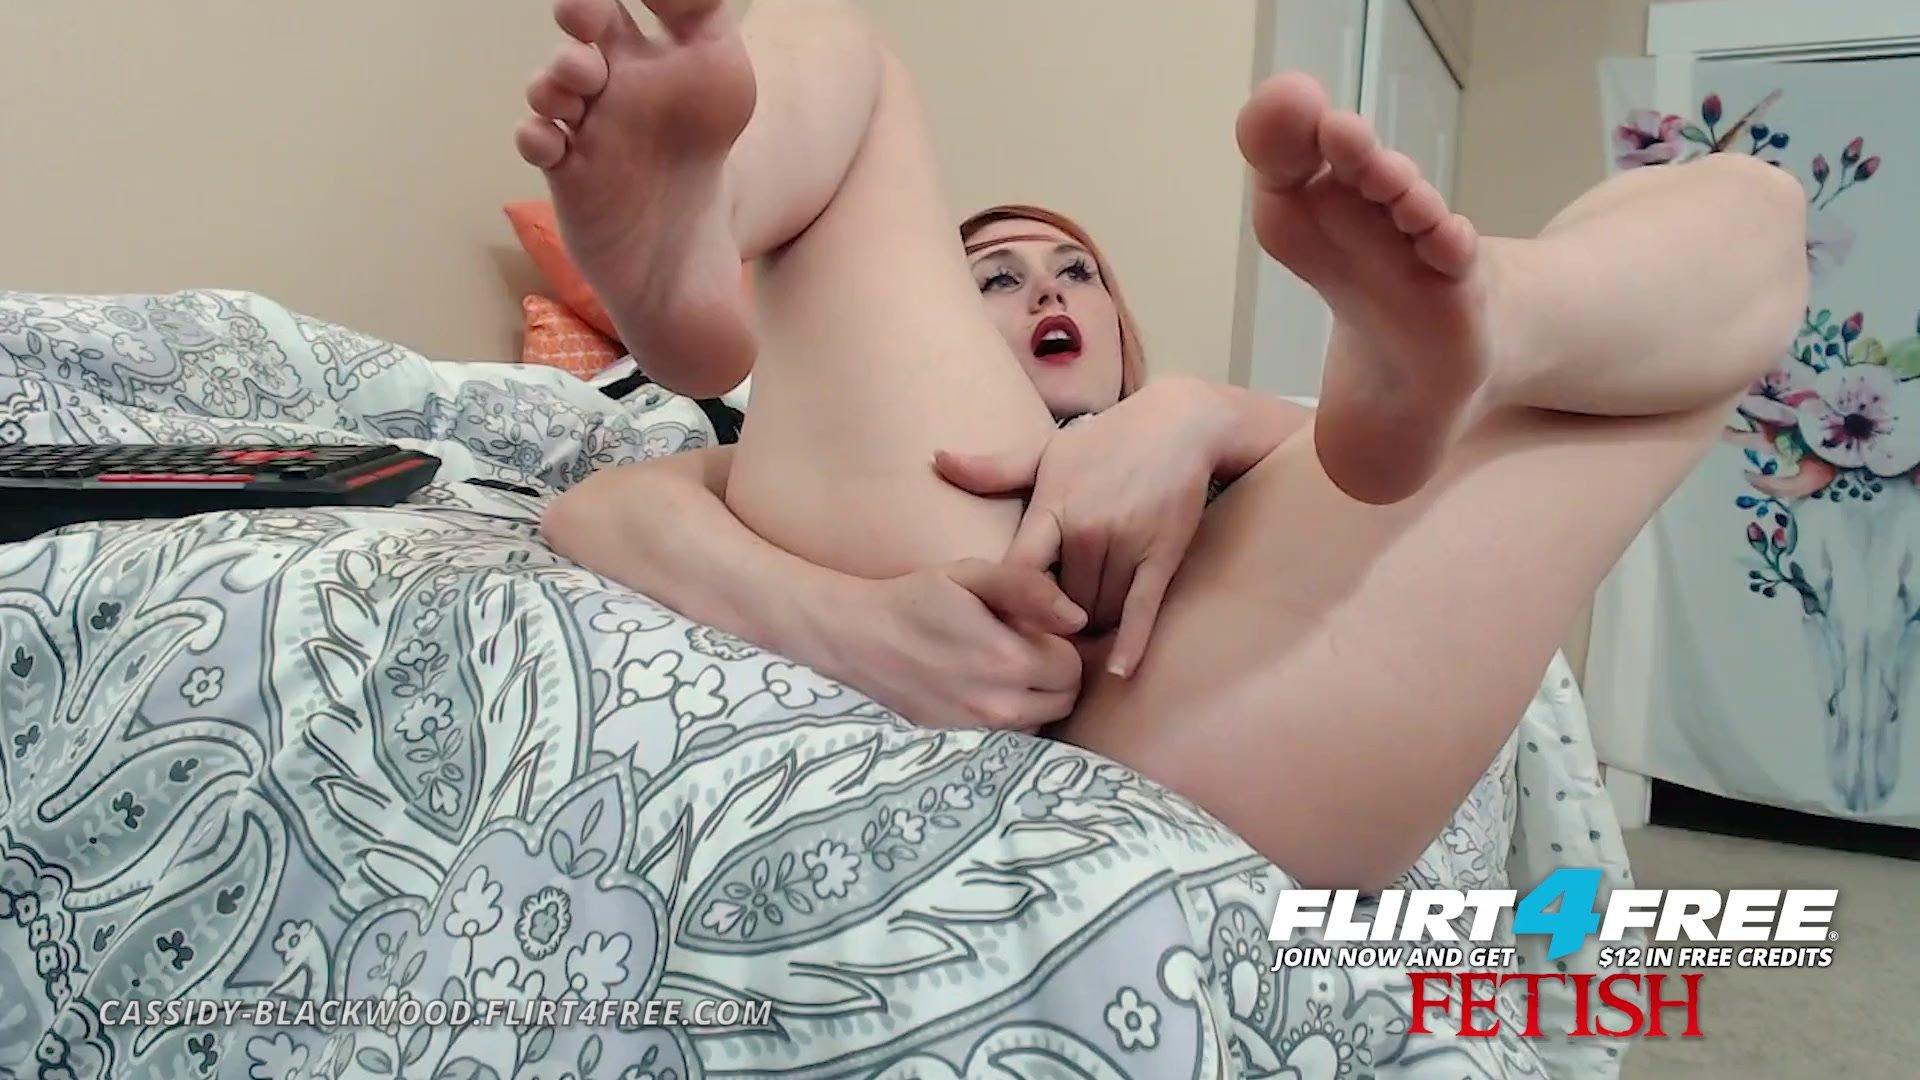 Cassidy Blackwood on Flirt4Free Fetish - Hot Camgirl Roleplays Foot Fetish